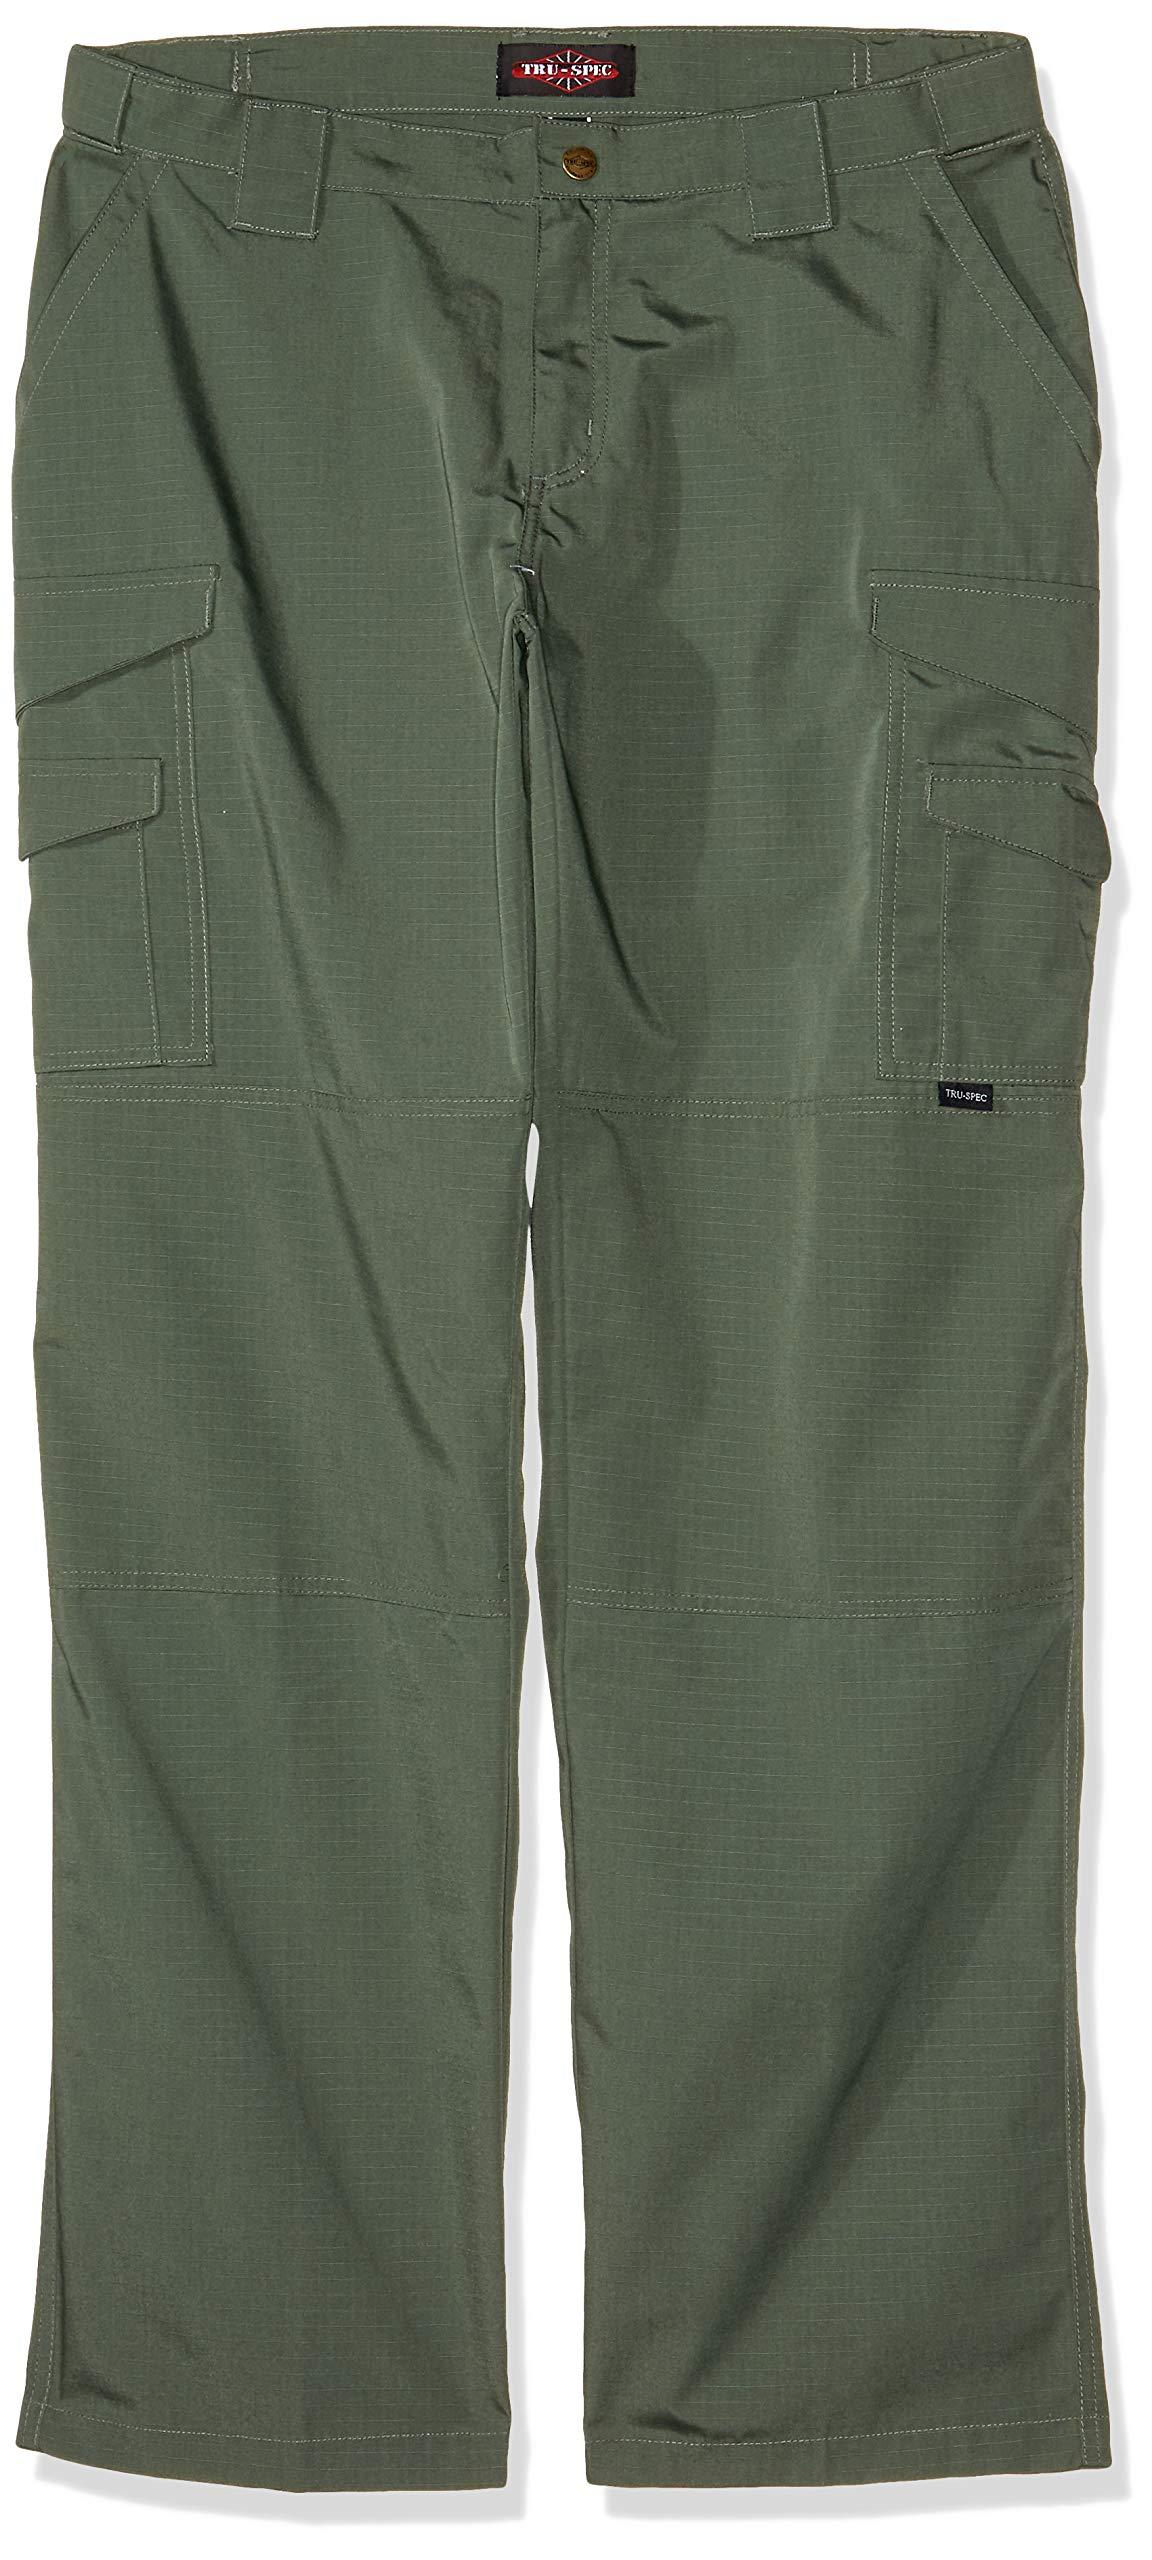 Tru-Spec Women's 24-7 Tactical Pants, Olive Drab, W: 4 Large: 30 by Tru-Spec